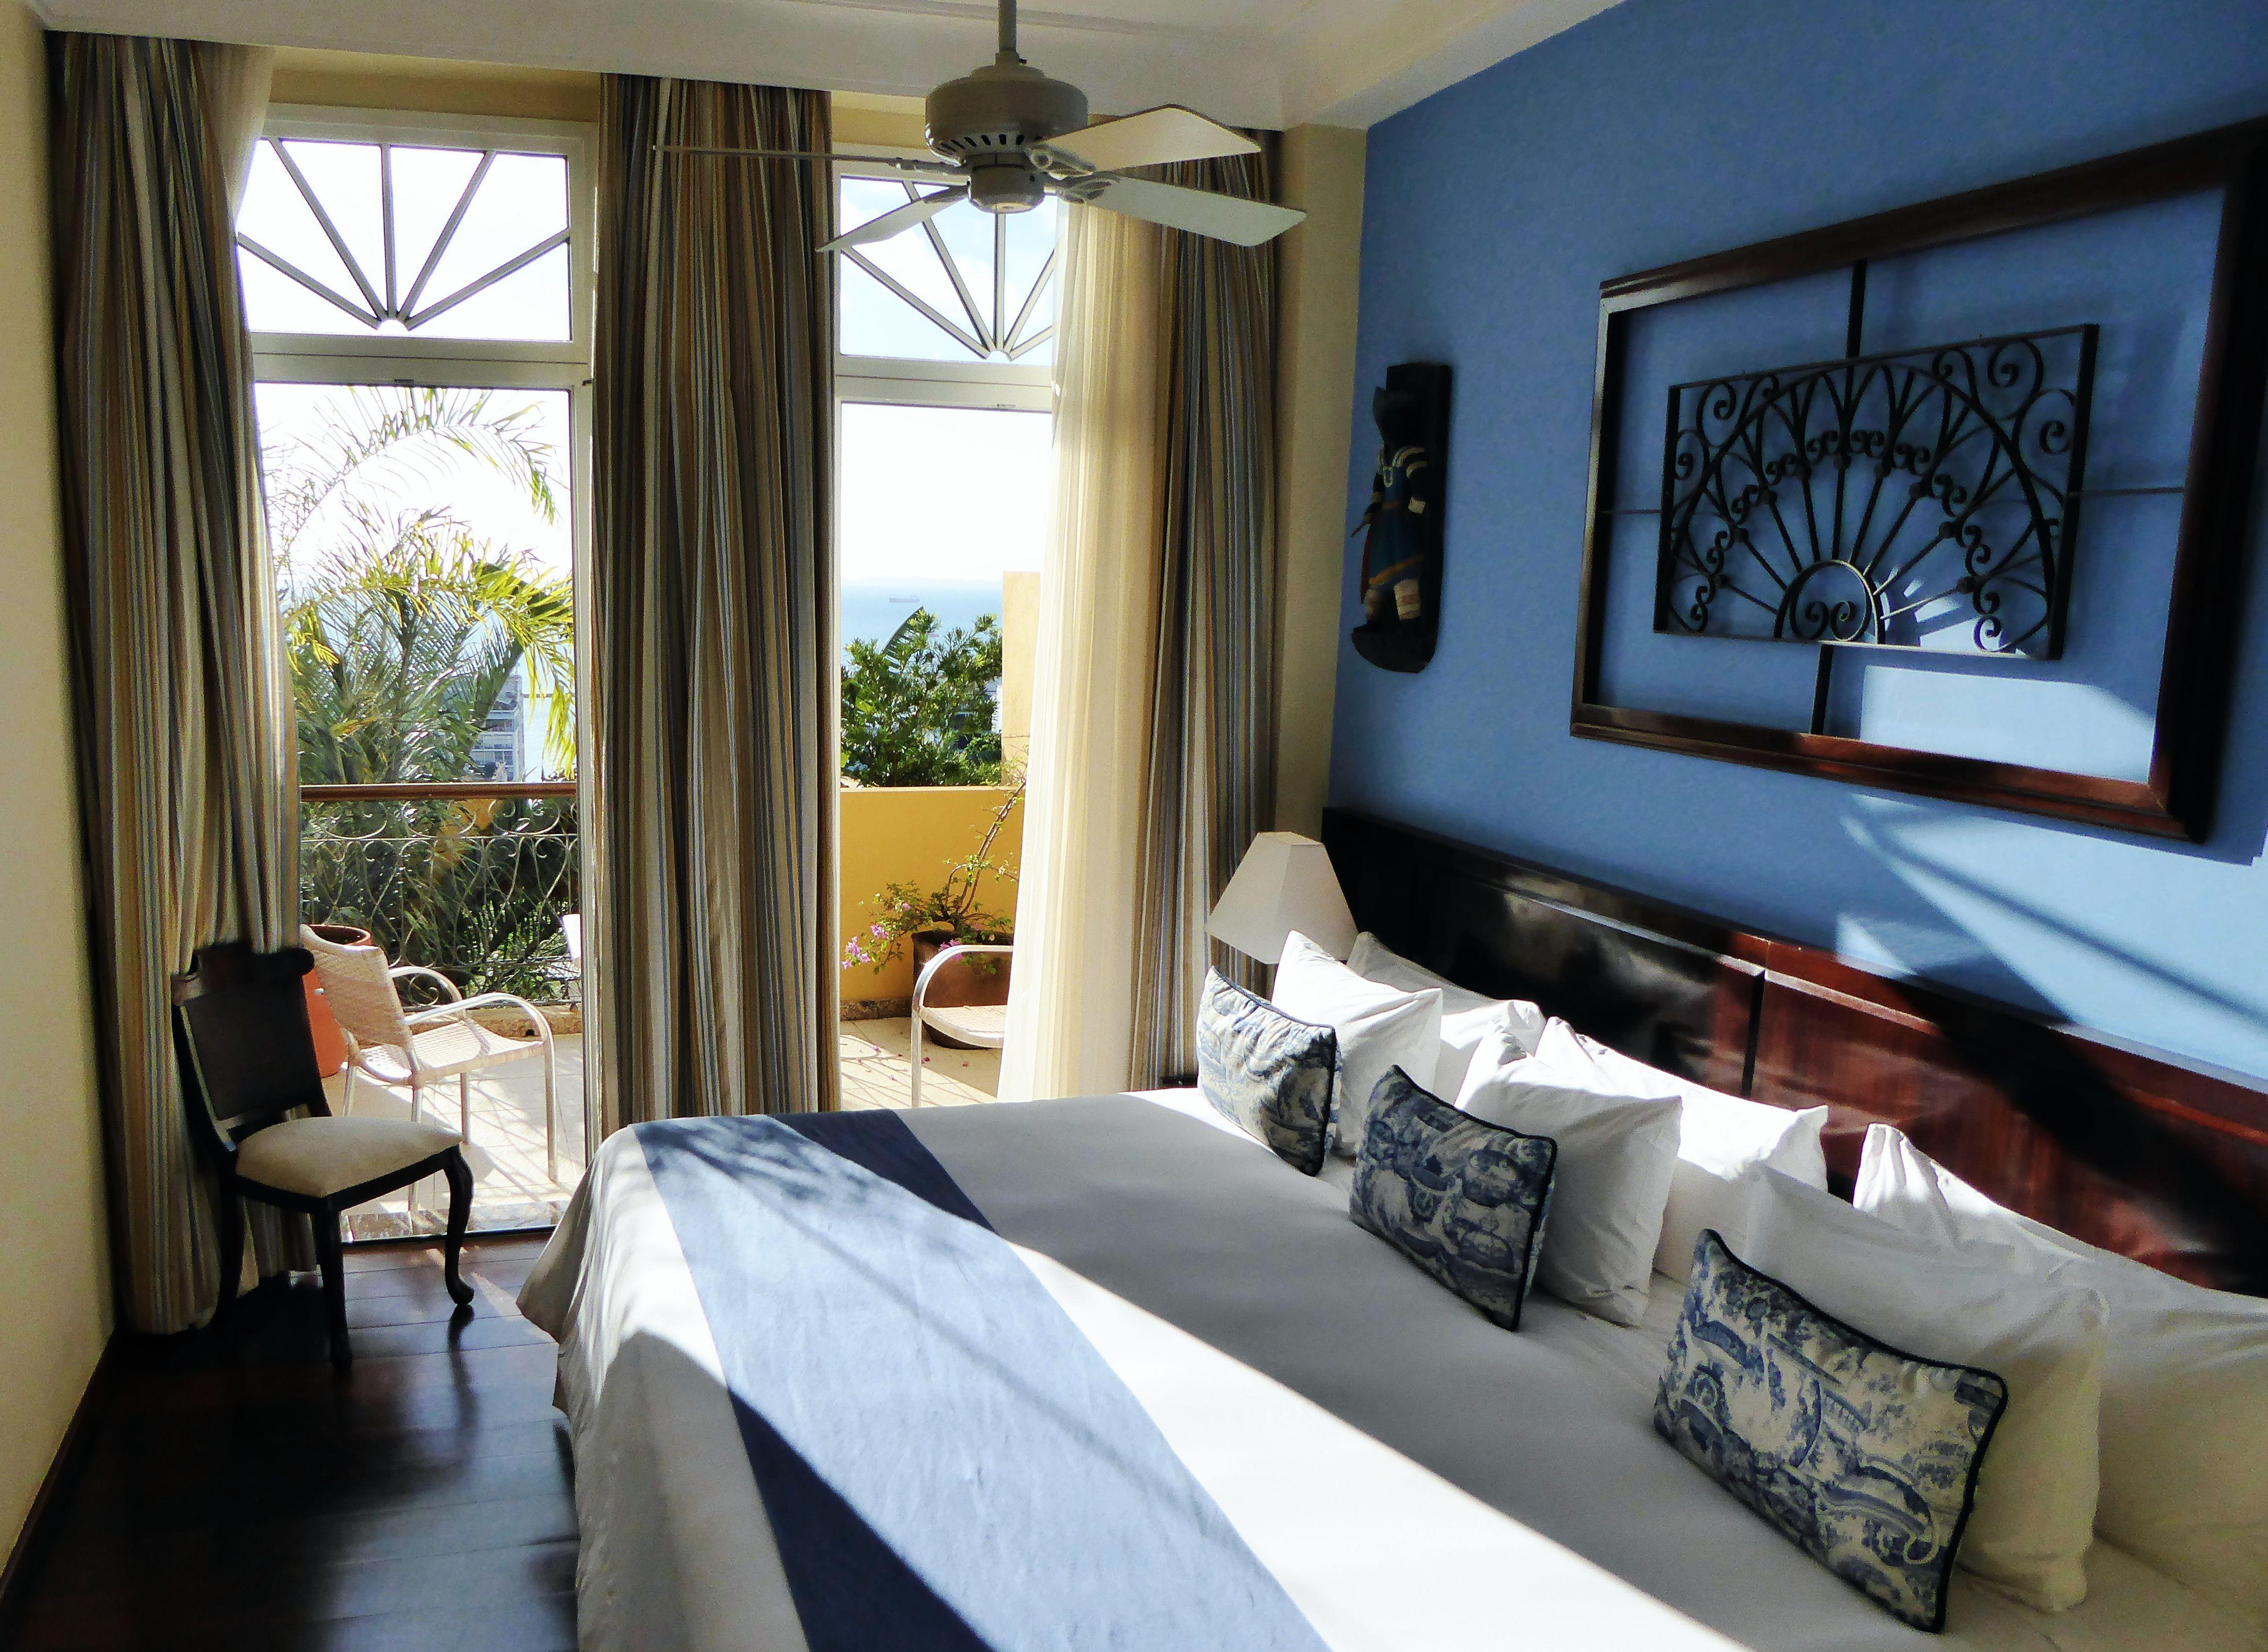 Deluxe Room at Casa do Amarelindo